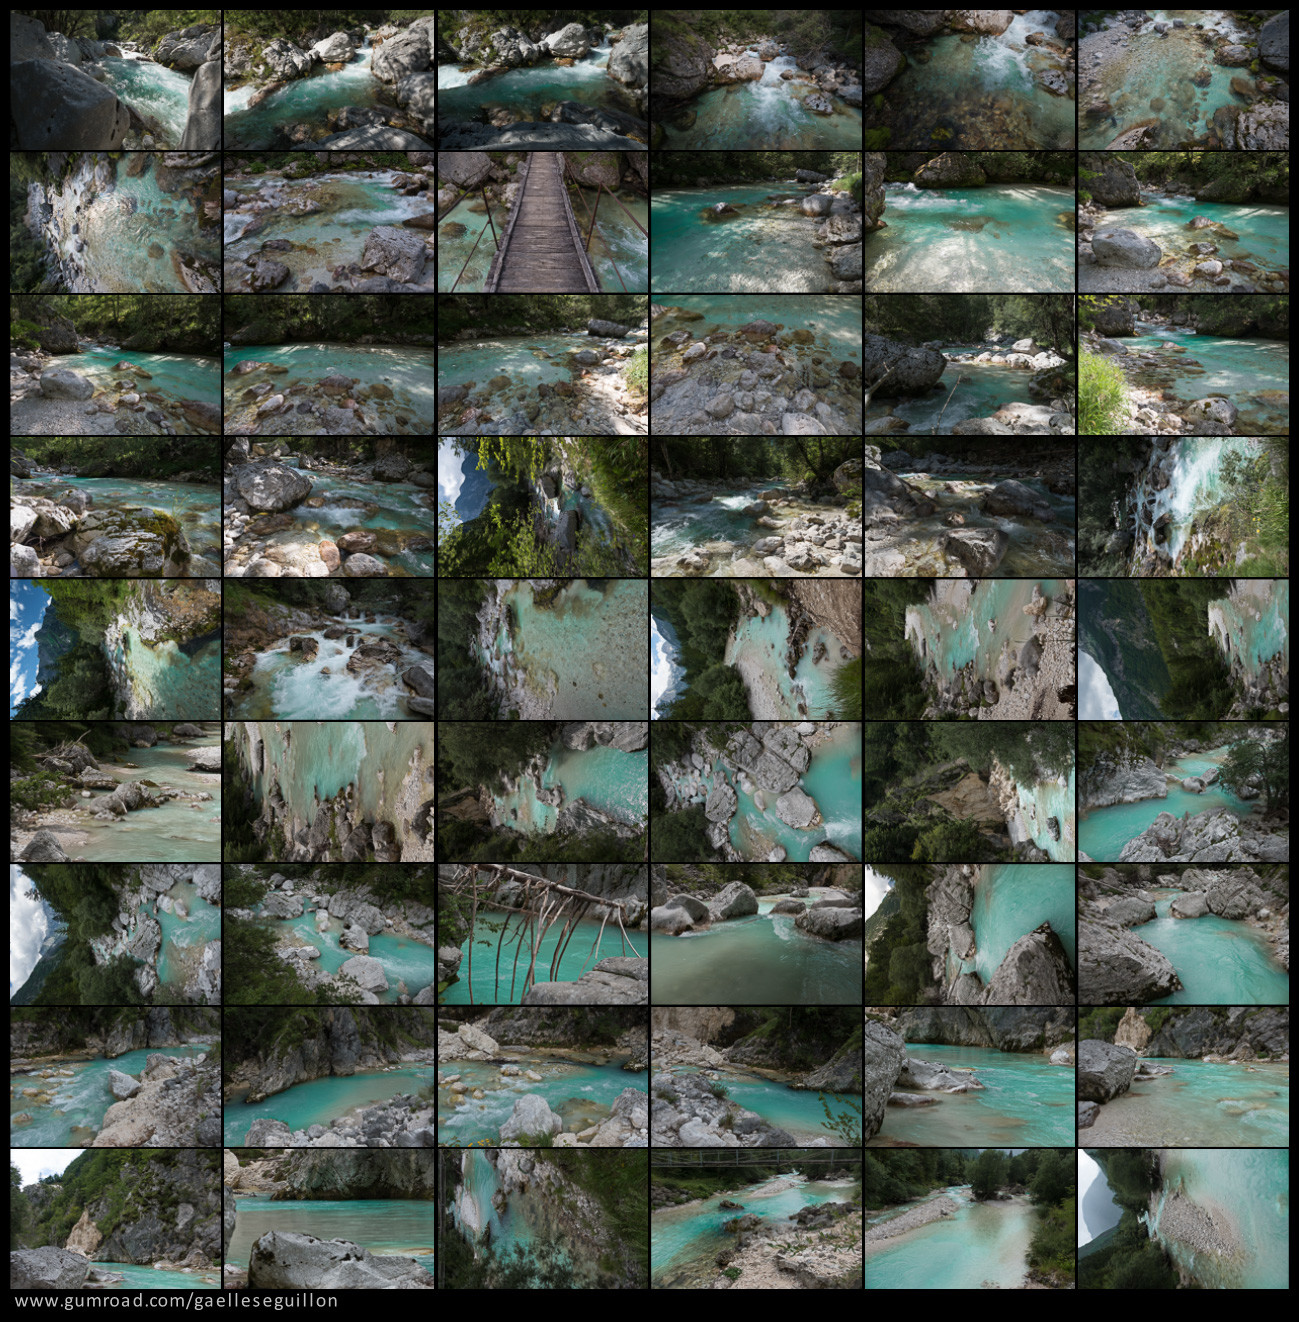 Soca river preview 1